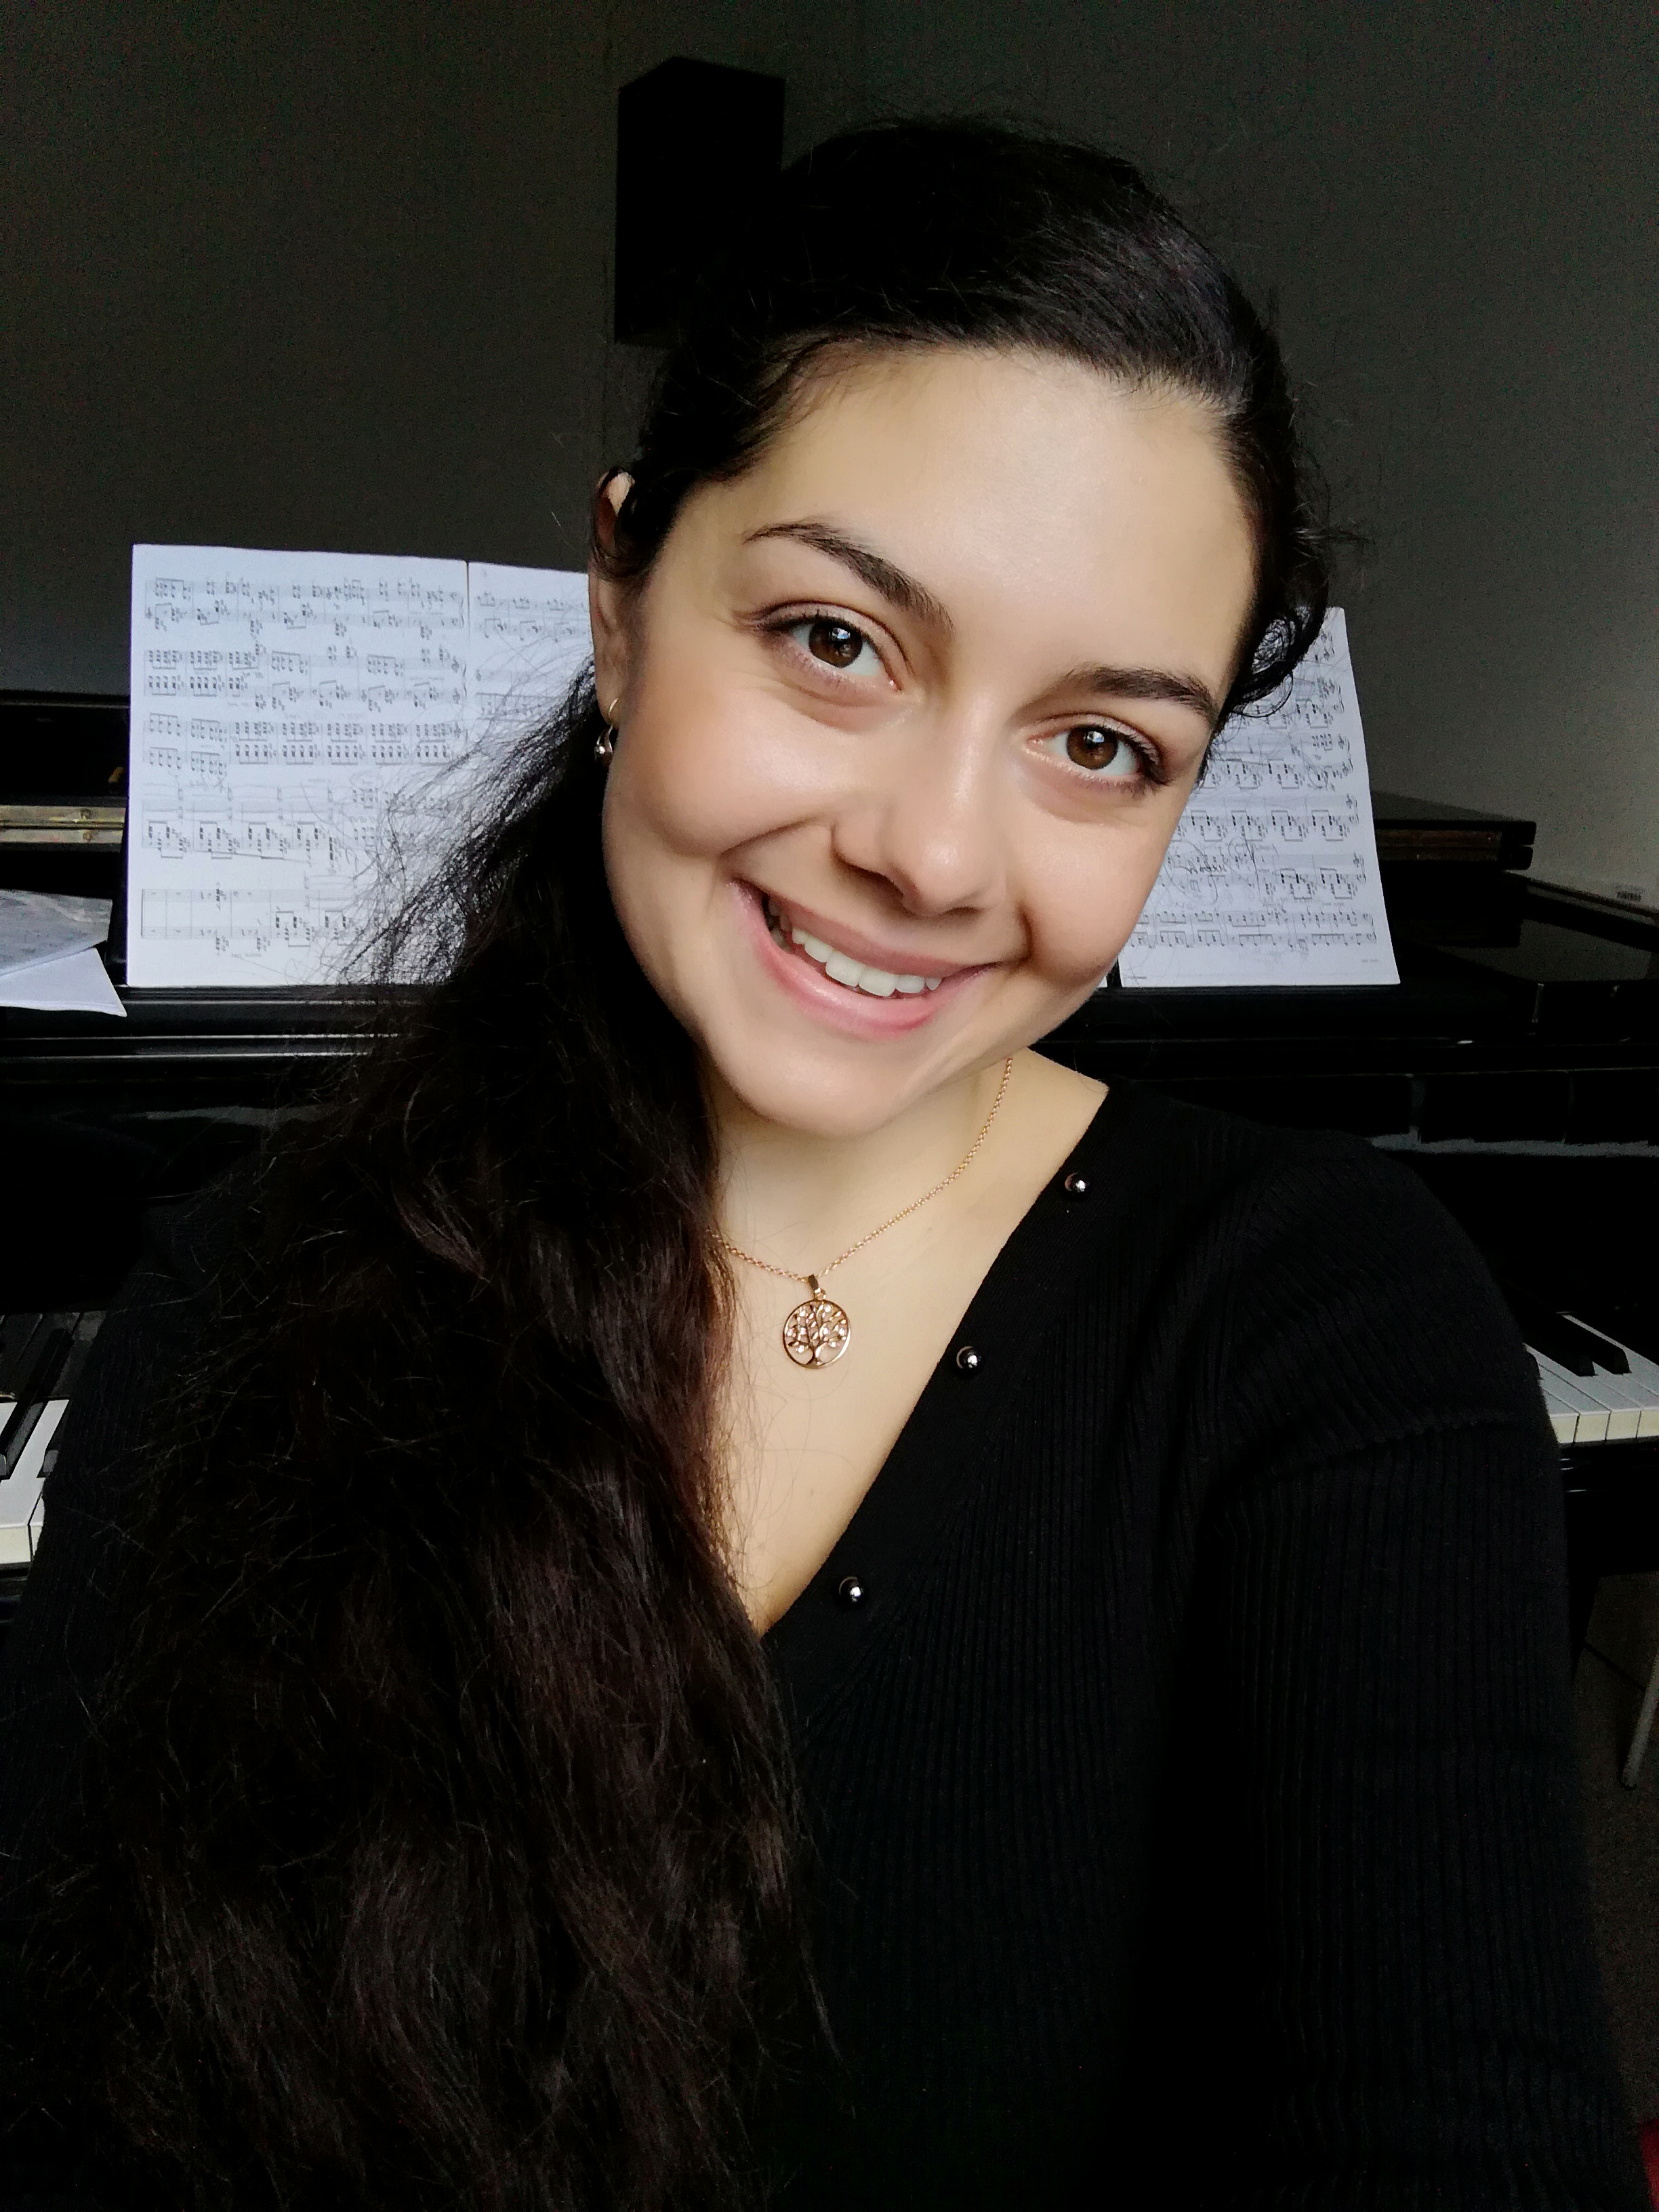 Bc. Soňa Tóthová - klavír